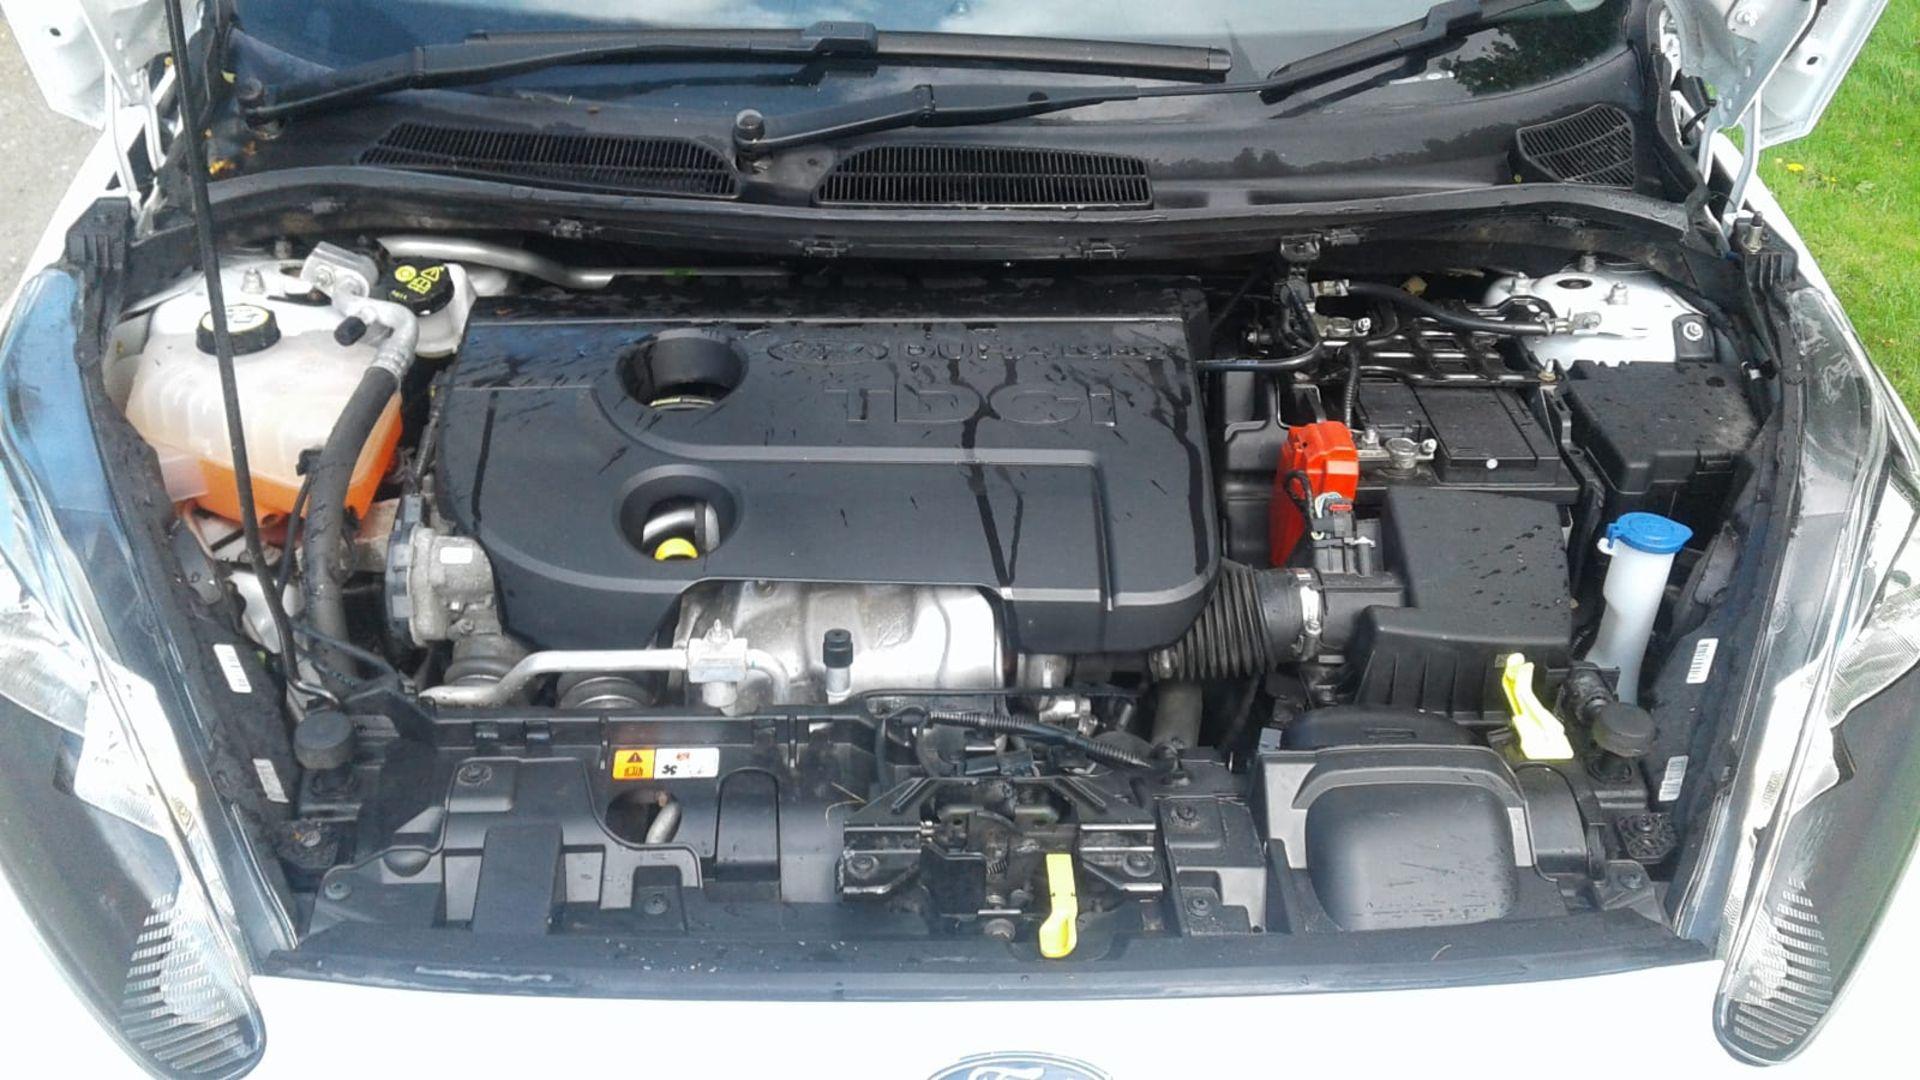 Lot 32 - 2014/14 REG FORD FIESTA ECONETIC TECH TDCI 1.6 DIESEL CAR / VAN, SHOWING 0 FORMER KEEPERS *NO VAT*